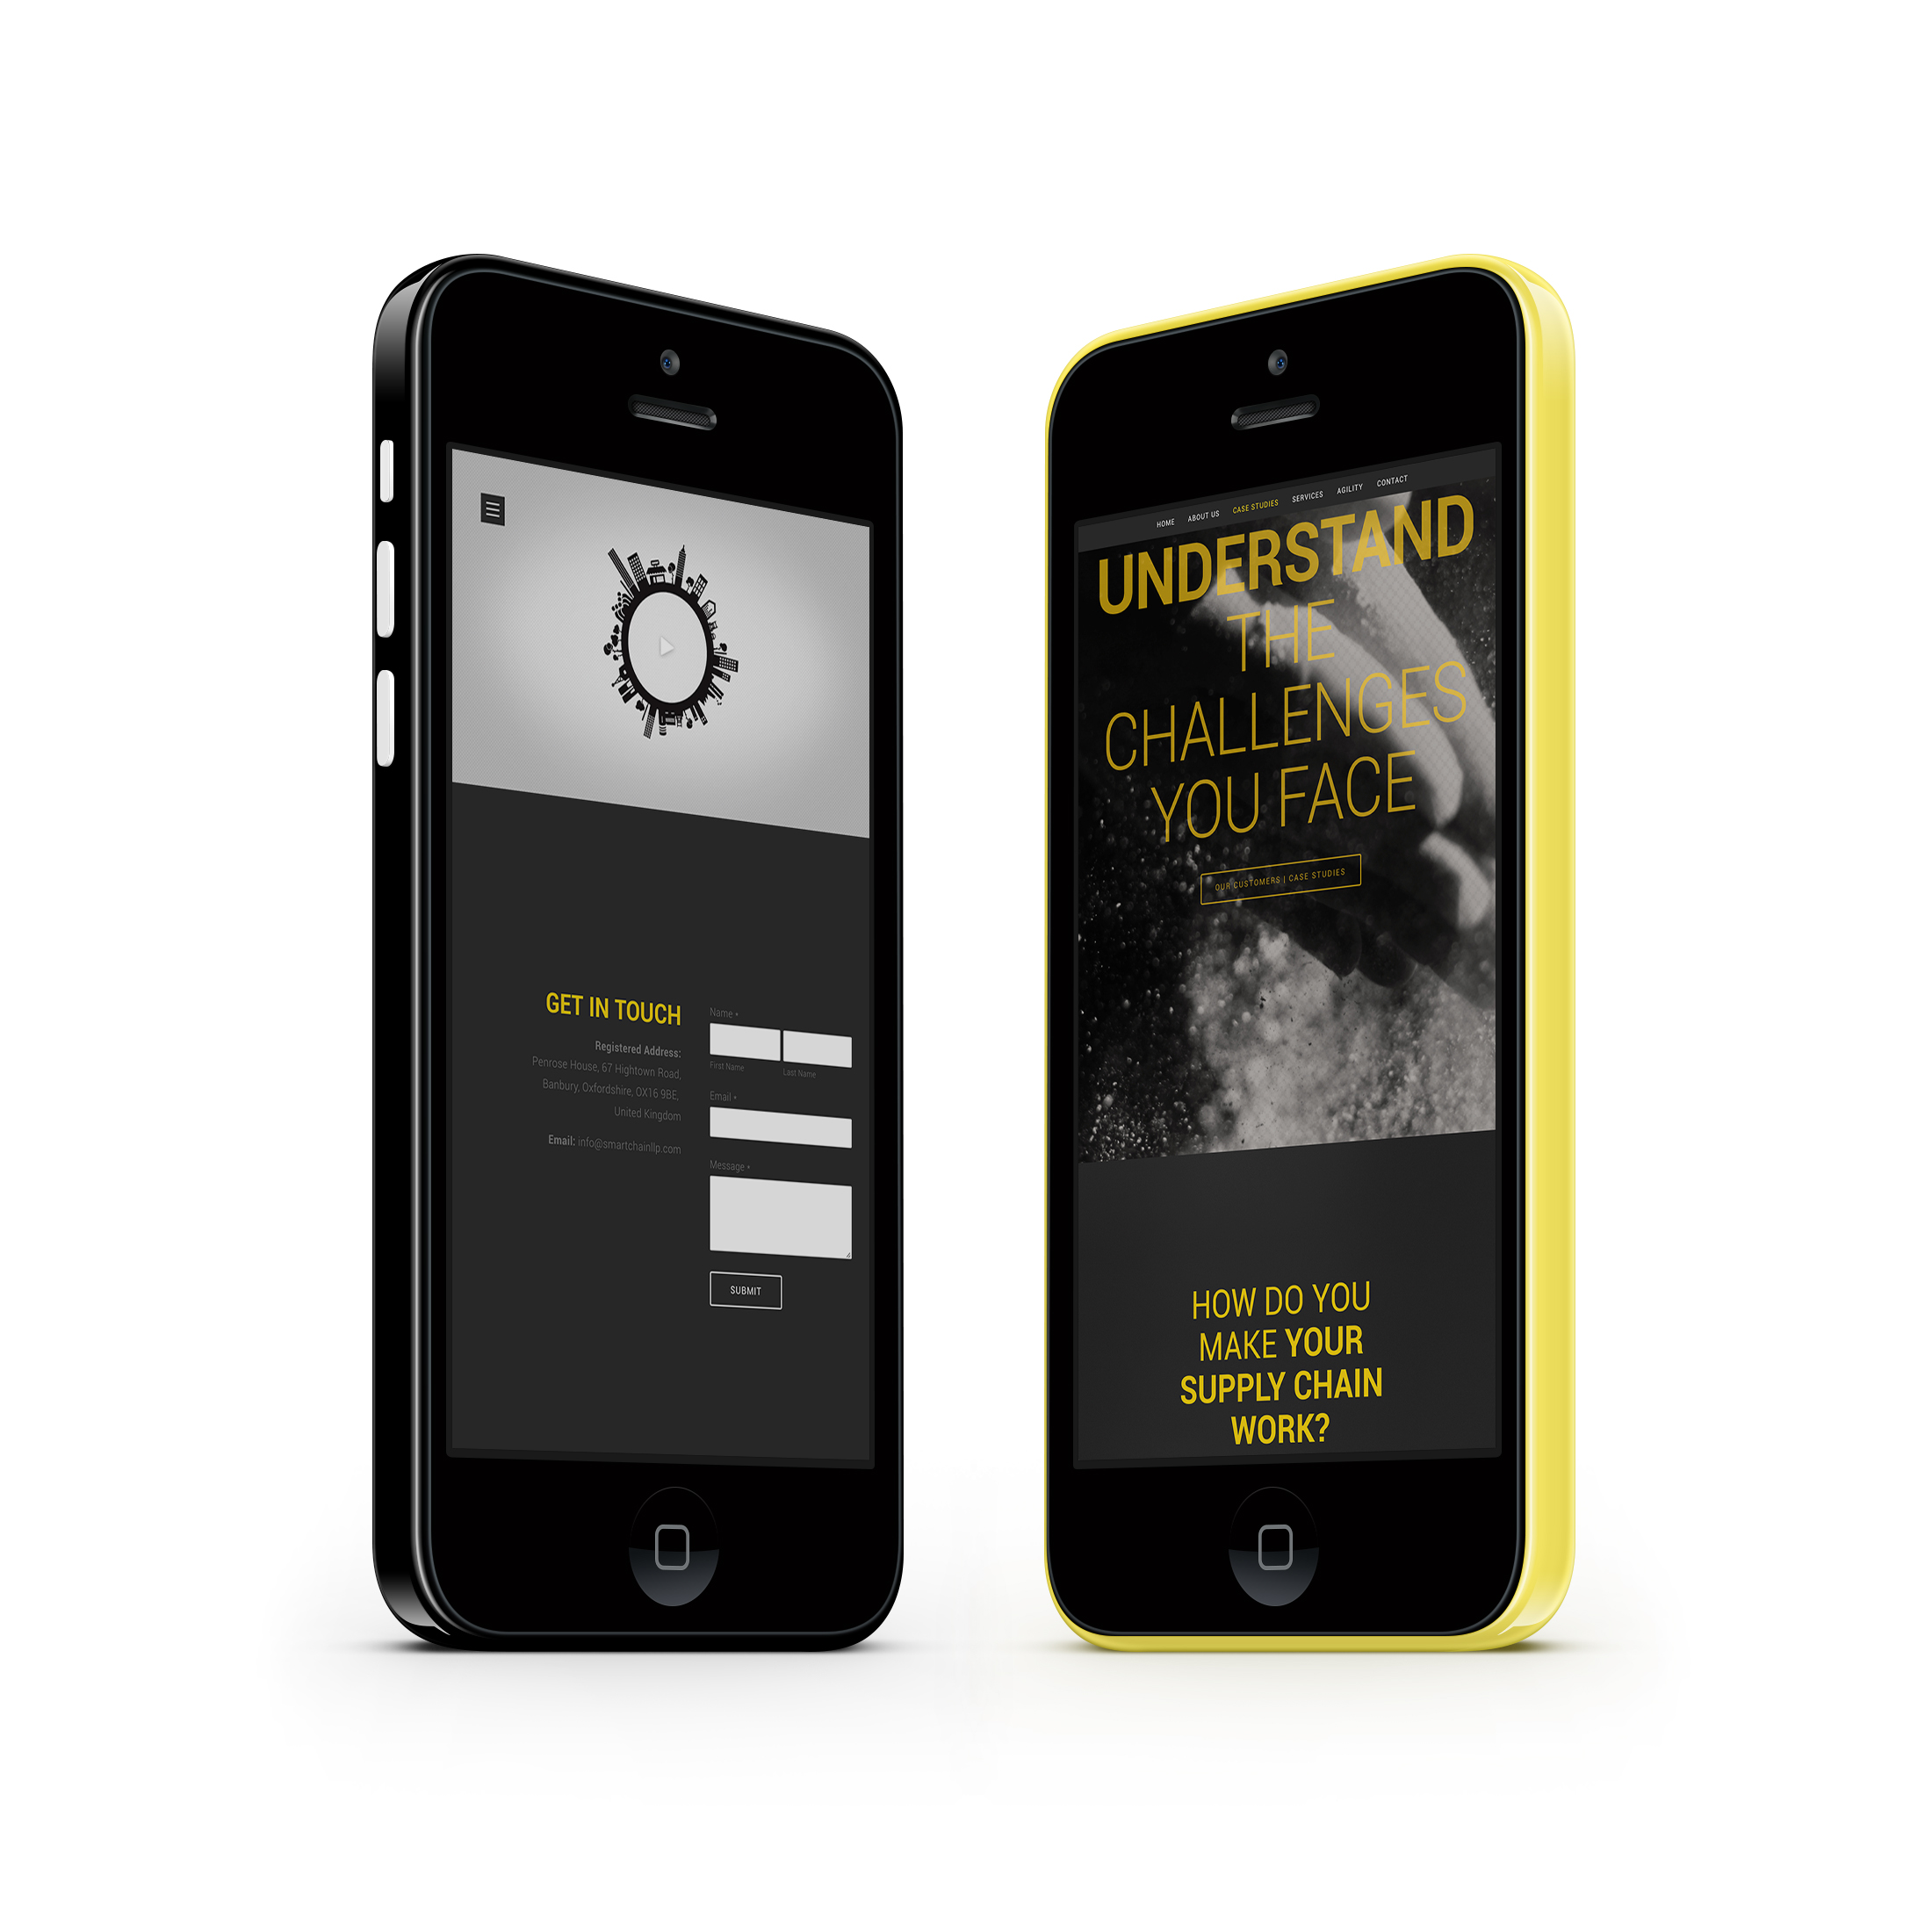 Smartchain Website Webdesign Graphic Design I Phone Developed bonjourmolotov 09.jpg